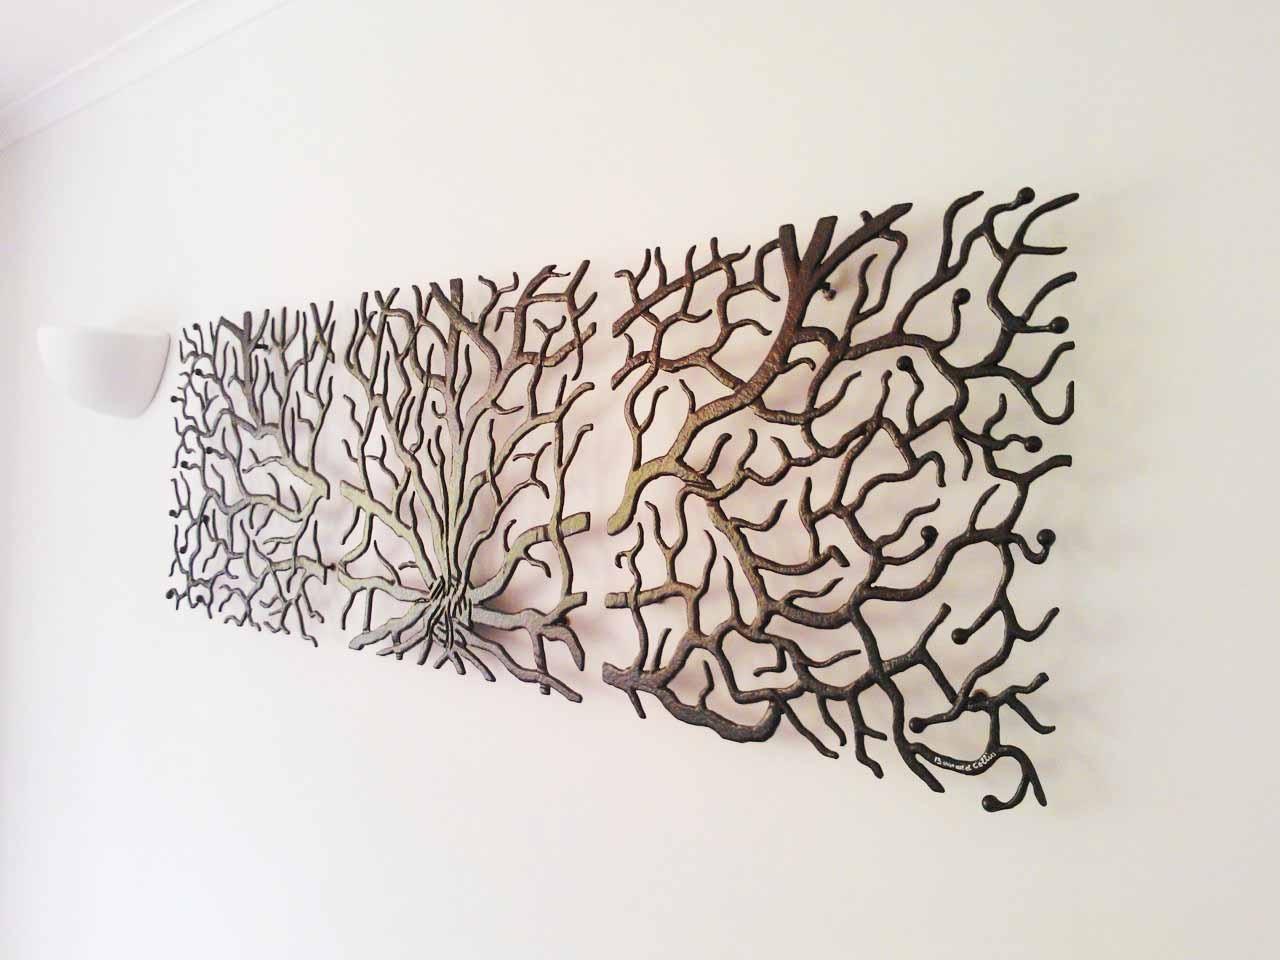 Metal Tree Wall Art Decor Wallartideasinfo, Wall Art Tree - Swinki pertaining to Metal Wall Art Trees (Image 6 of 20)